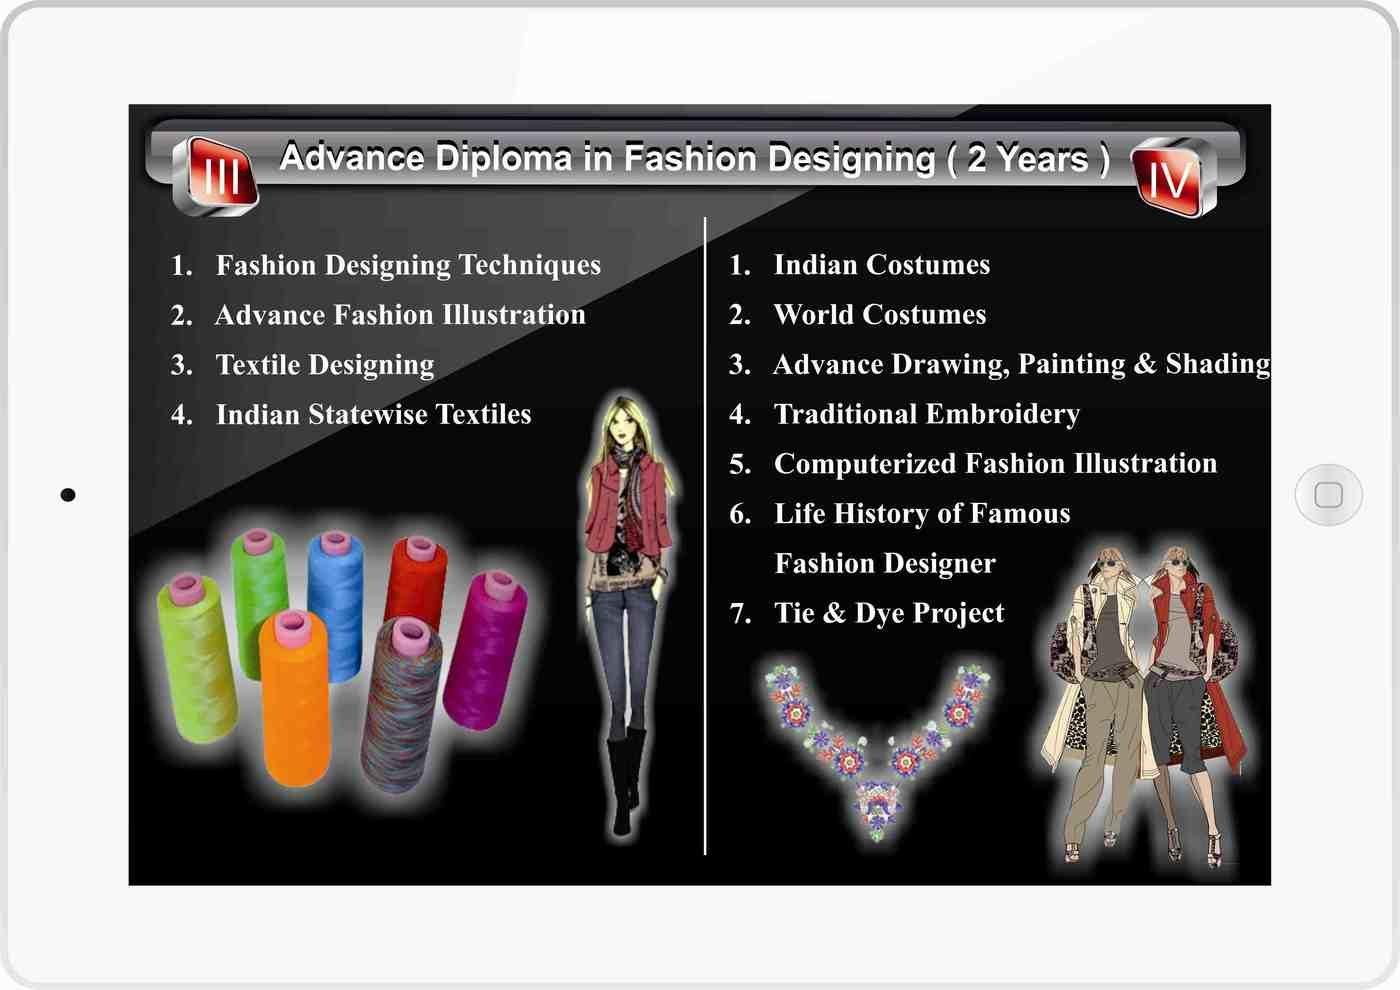 Department Of Fashion Design Garment Technology By Academy Of Art Design Govt Regd Institute Of Interior Design Fashion Design At Coroflot Com